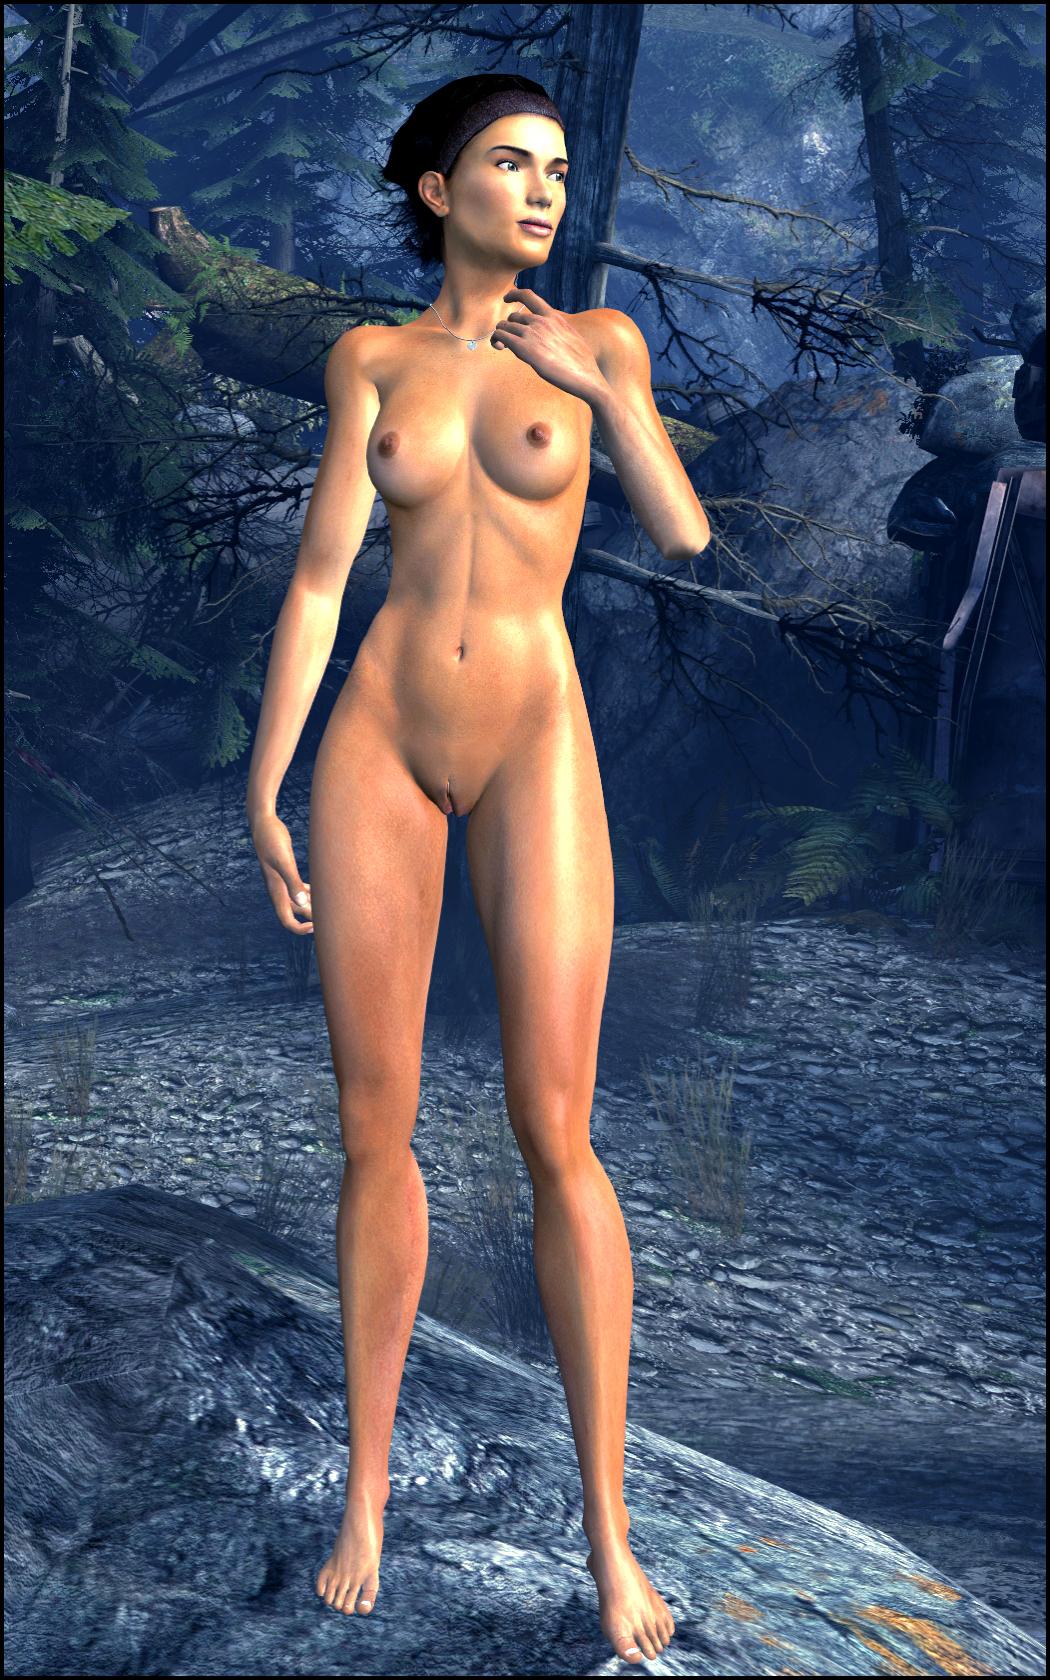 nude fallout 4 female mod Konosuba aqua doesn't wear panties